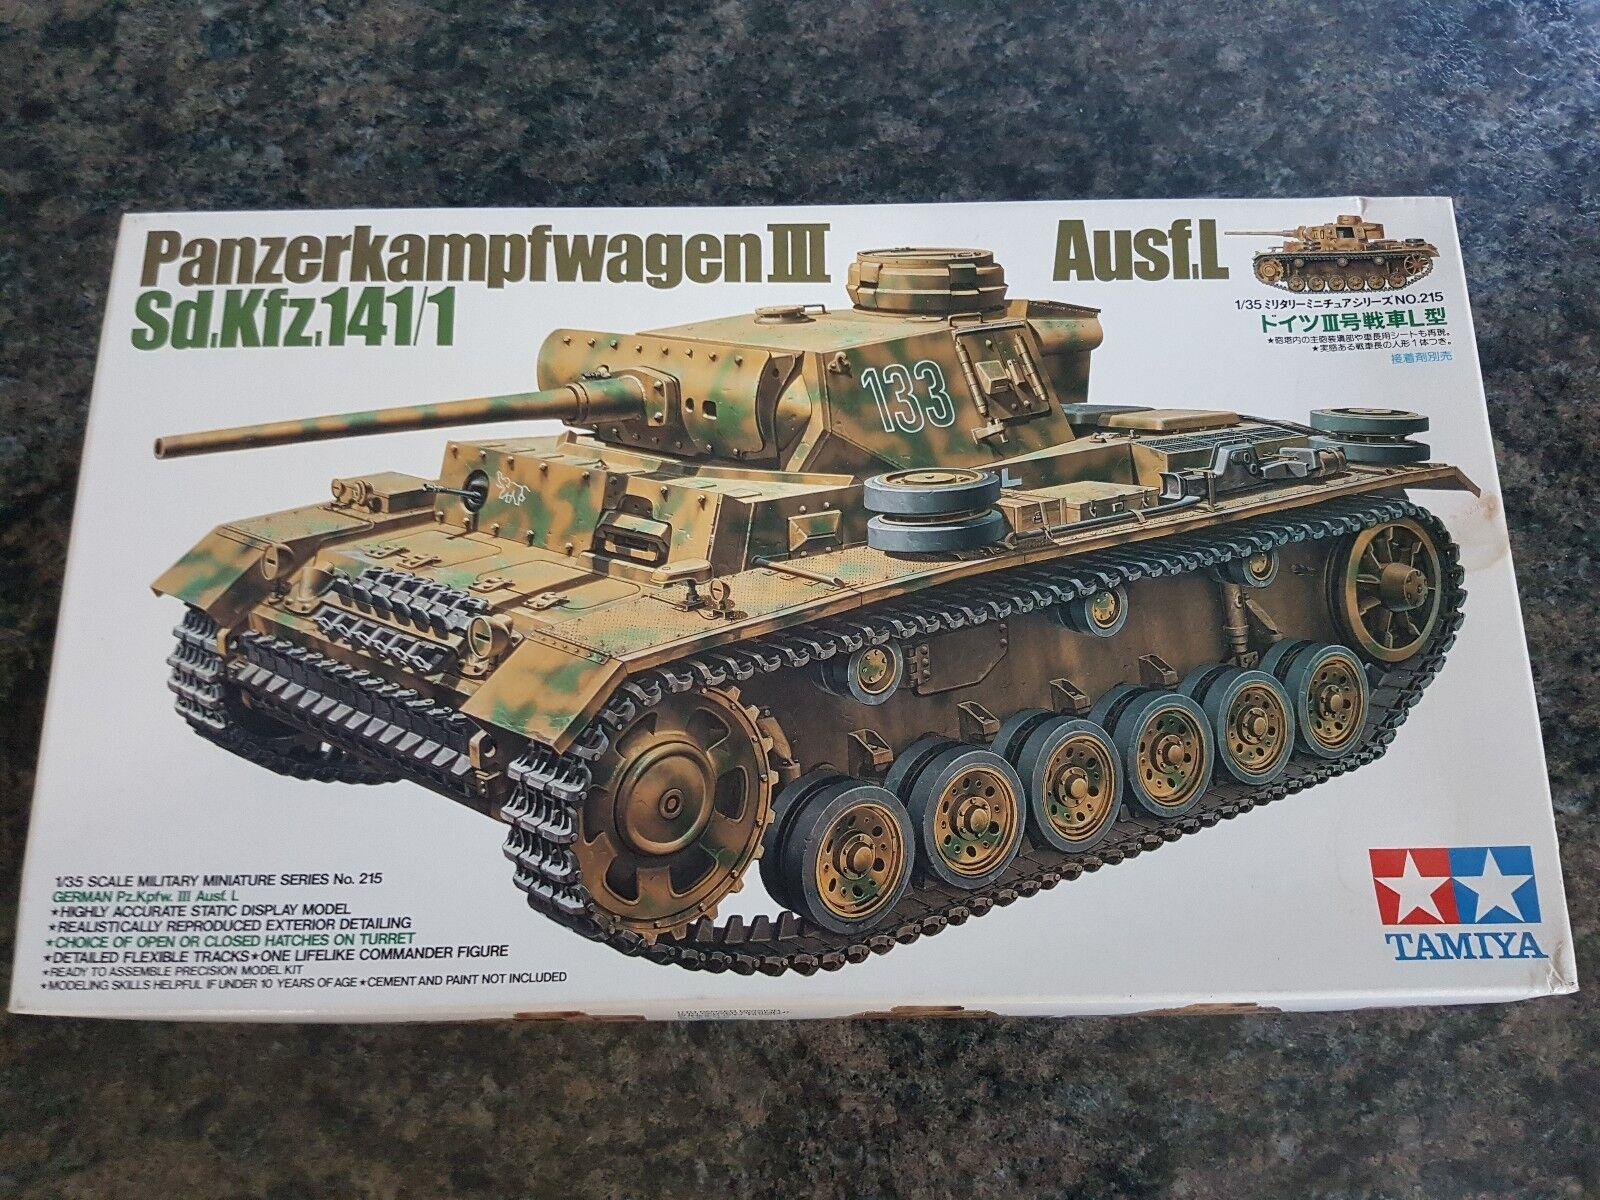 Tamiya 1 35 German Panzerkampfwagen III Ausf.L Tank Great Condition Very Rare